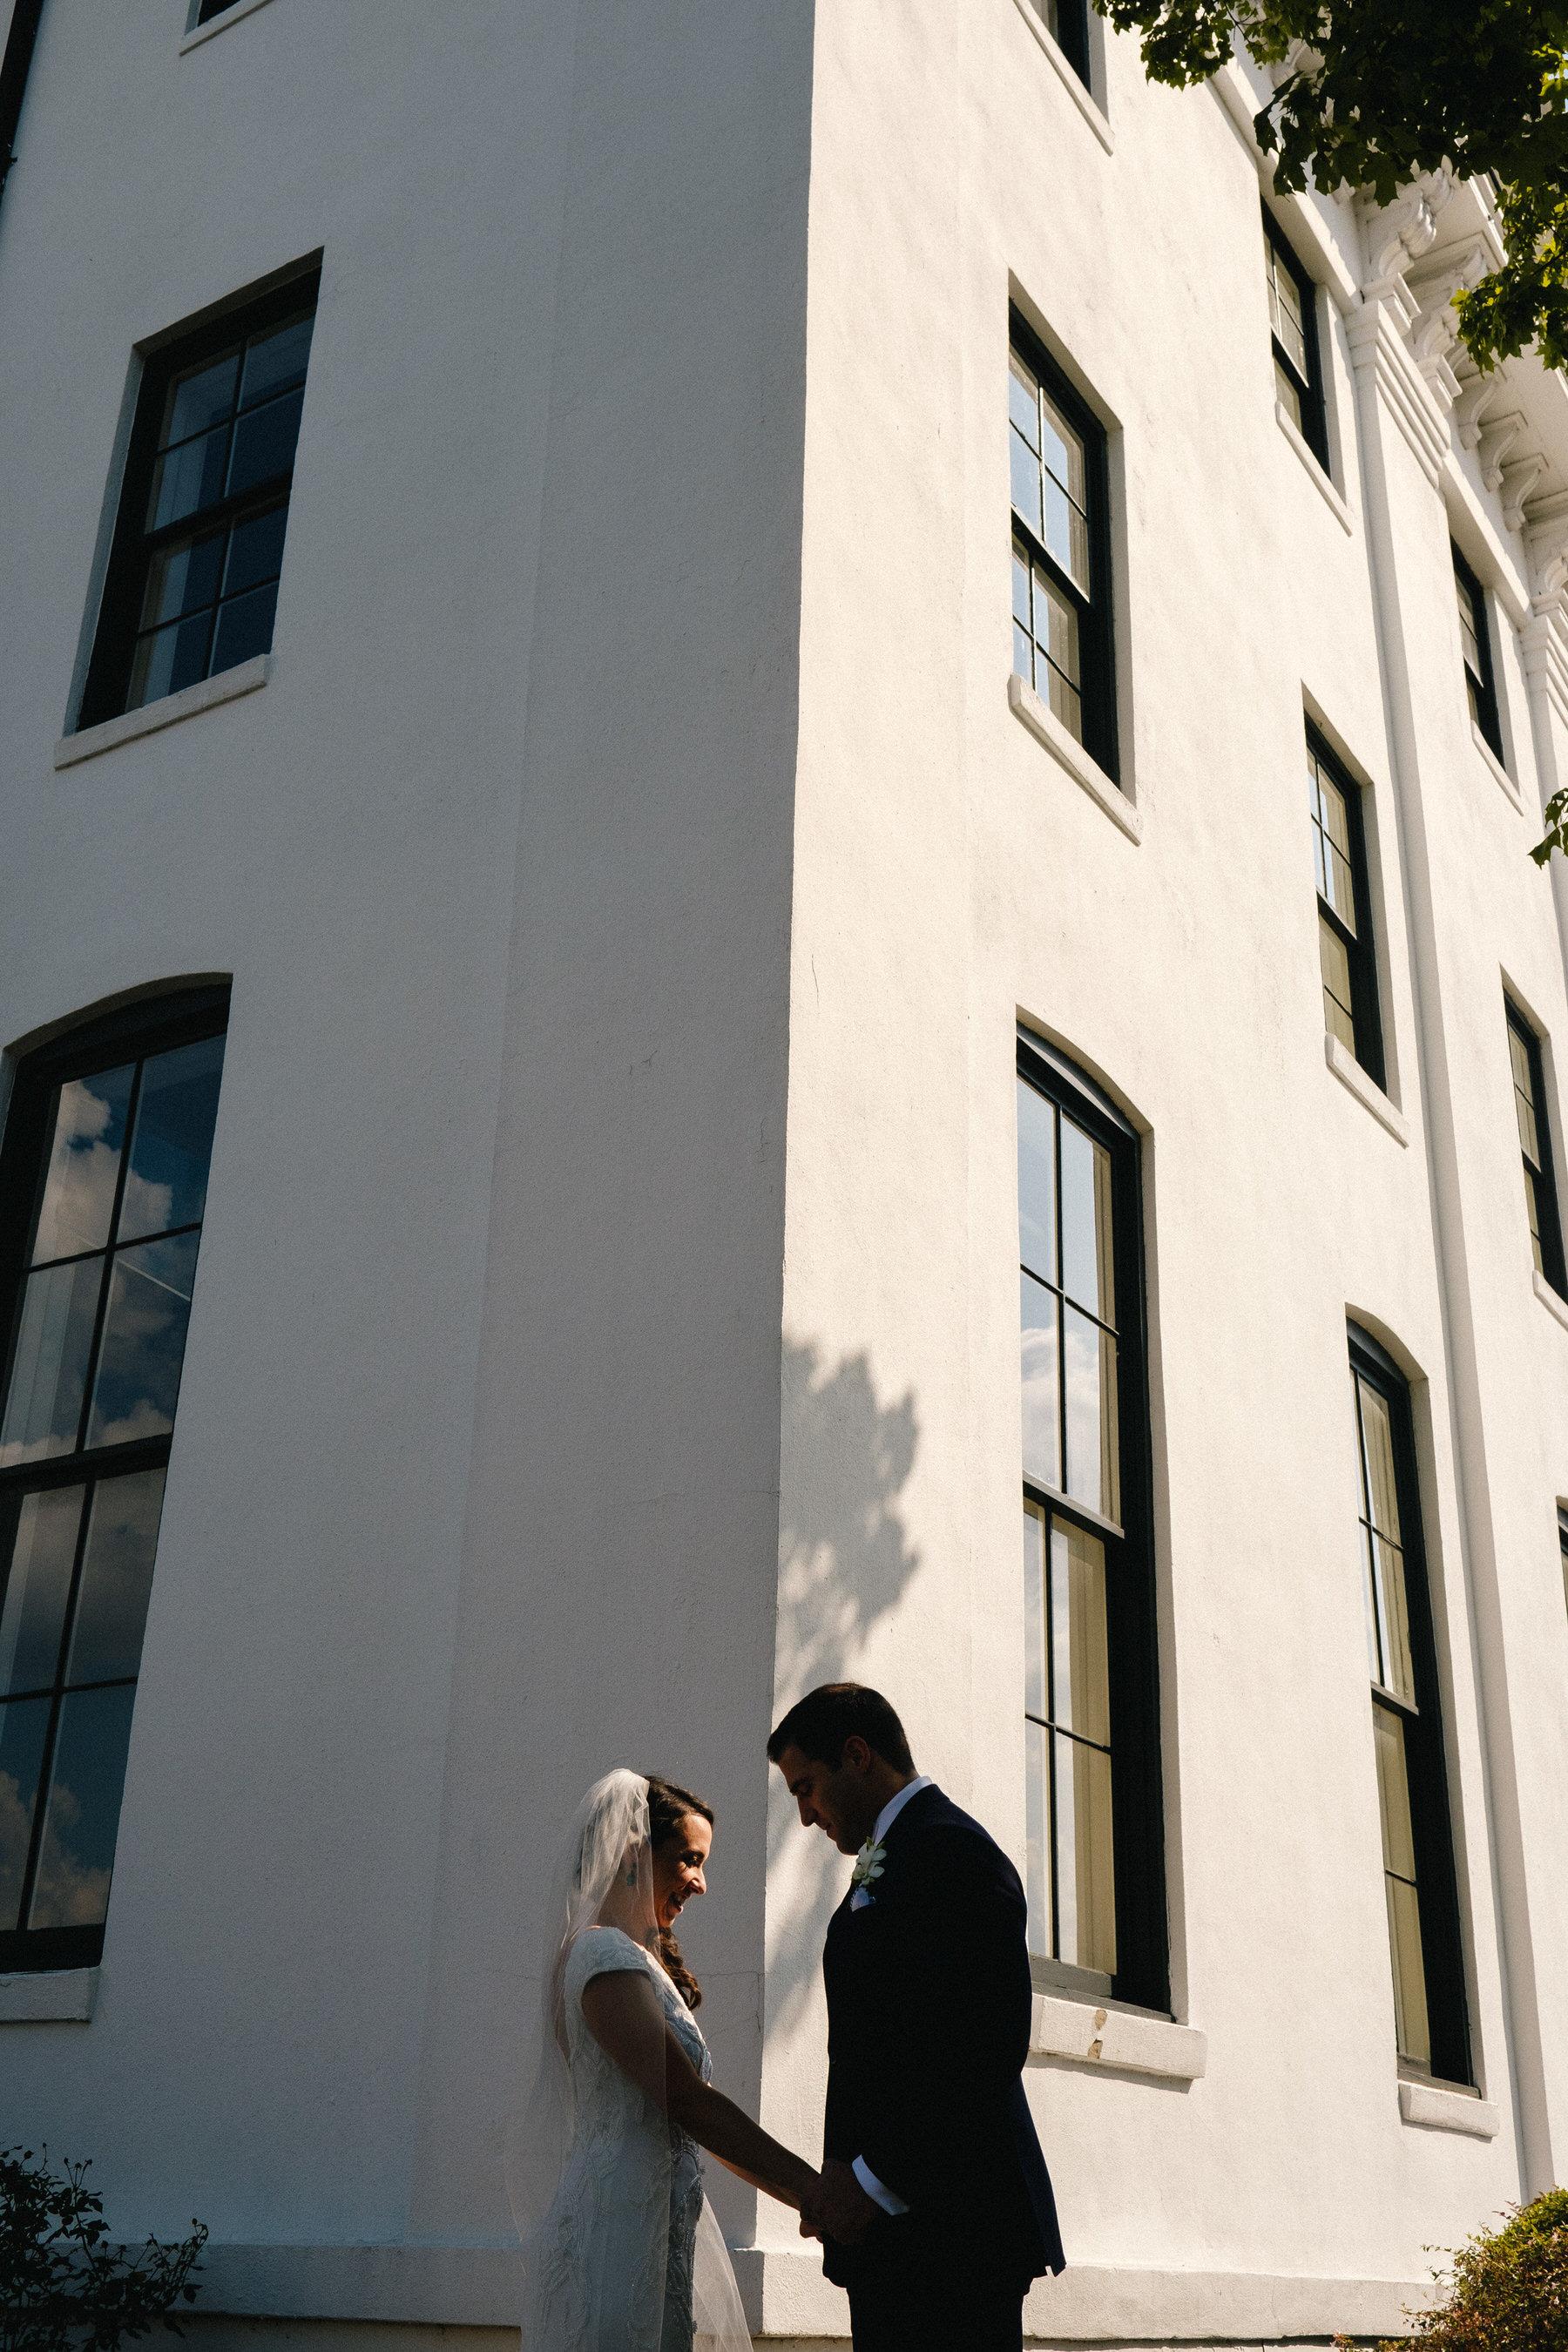 Oxford_mississippi_wedding_photographer_024.jpg